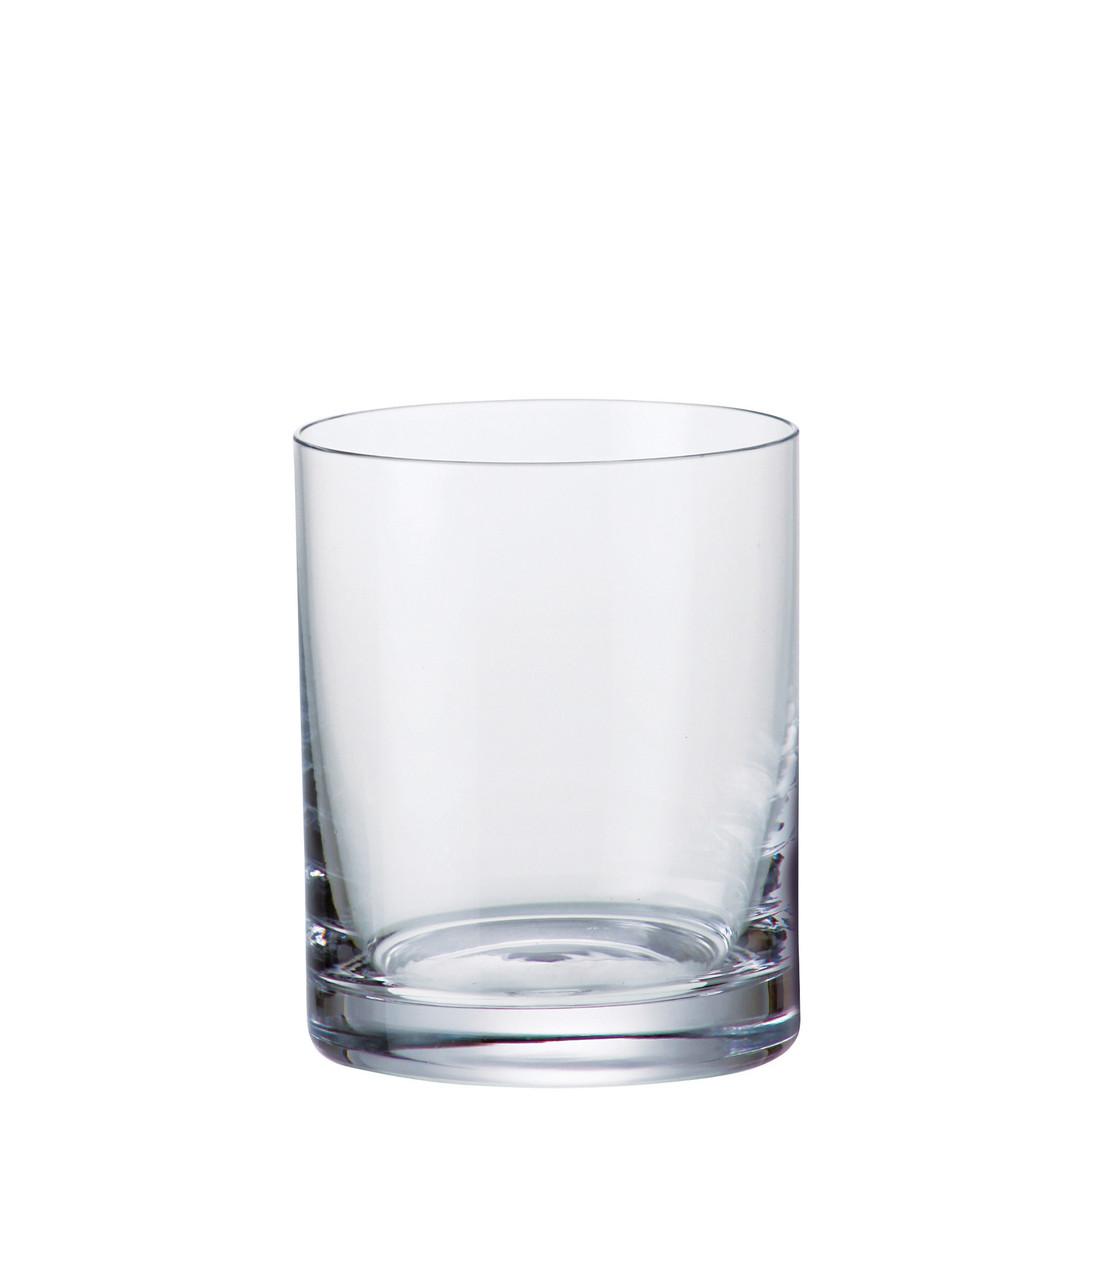 Стаканы NAOMI 320мл виски 6шт. 2S260/0/00000/320. Алматы